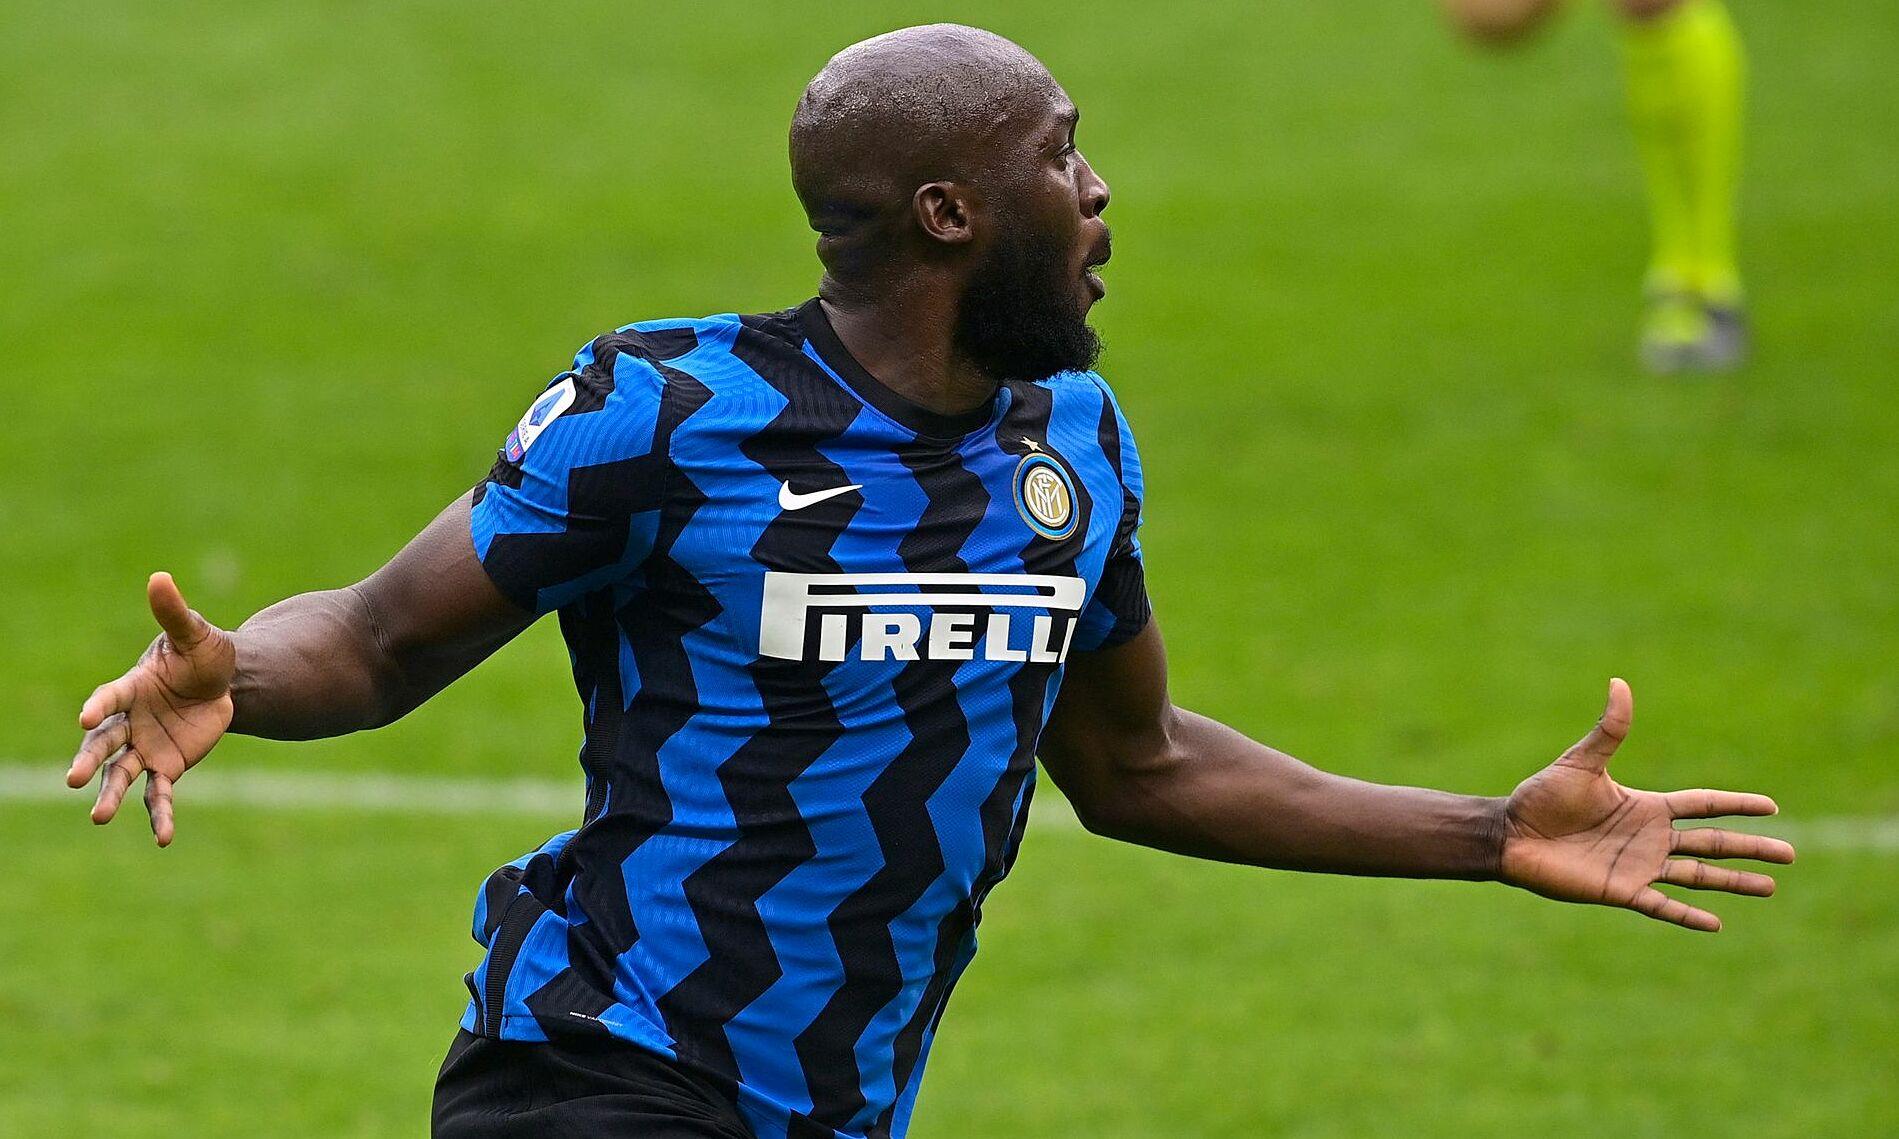 Lukaku bersinar di derby Milan dengan satu gol, satu assist.  Foto: Sky Sports